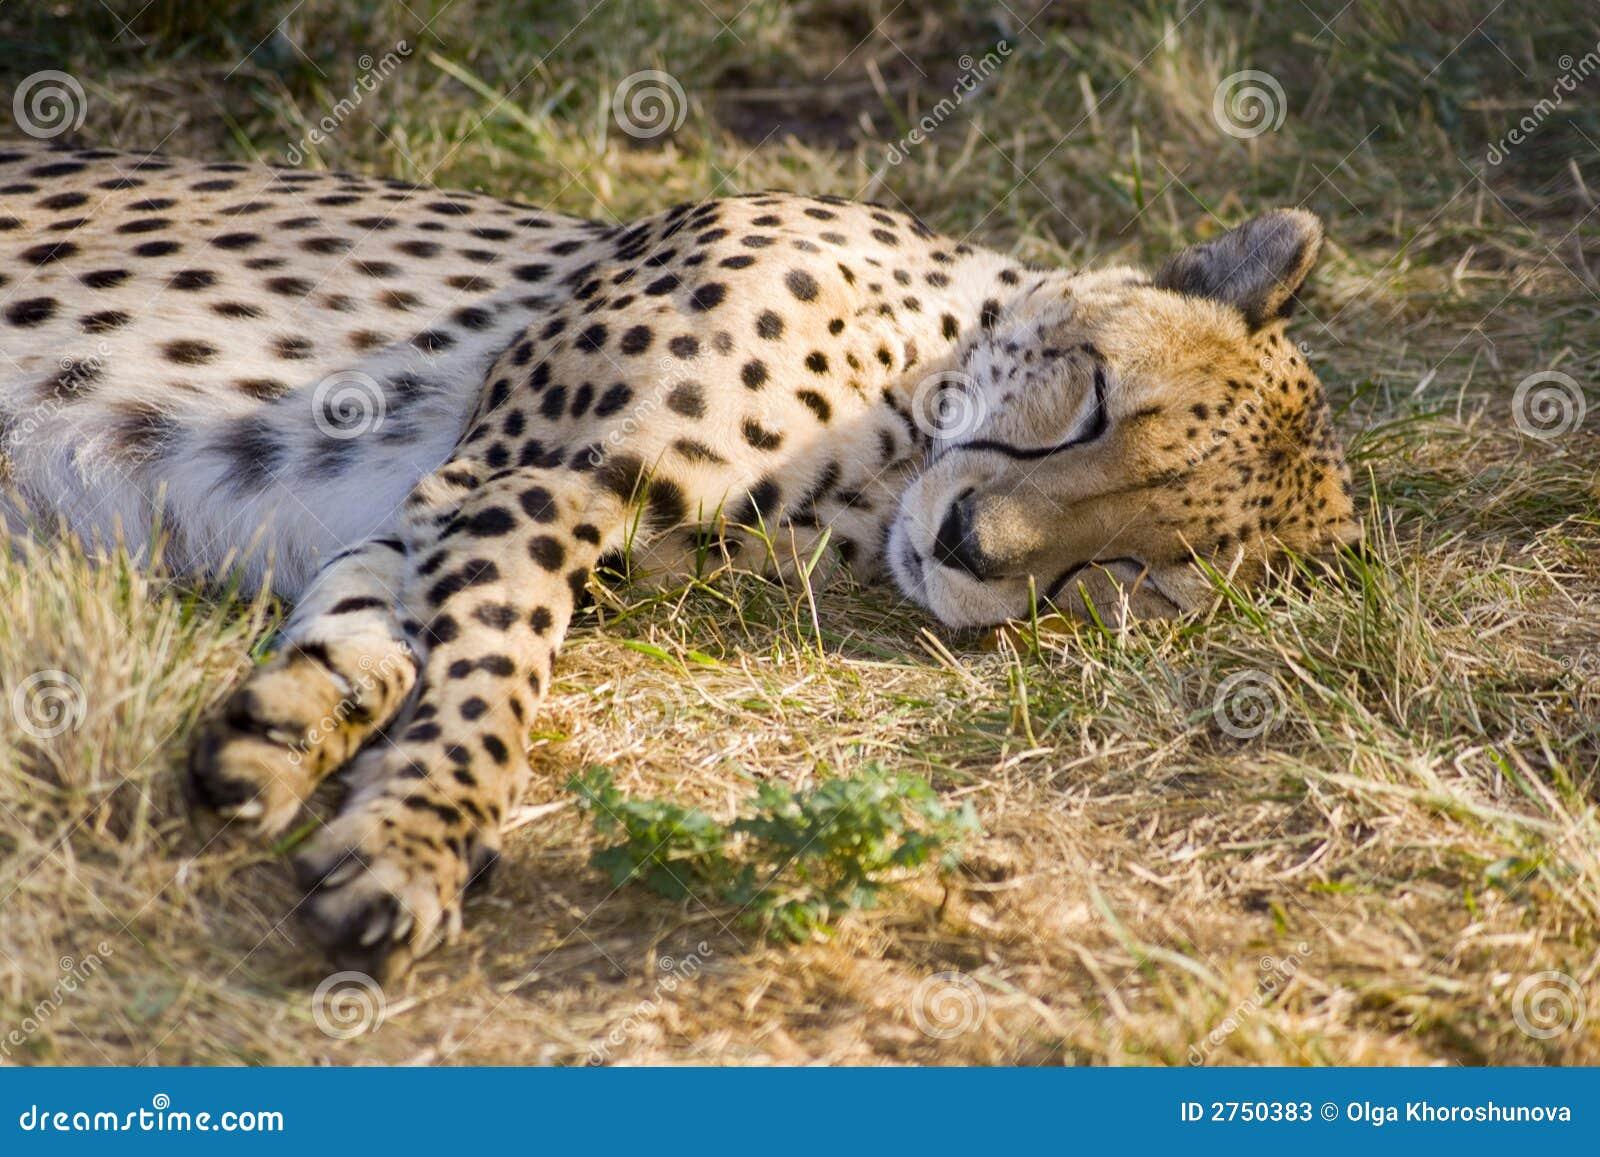 sleeping cheetah stock image image of sleeping head 2750383